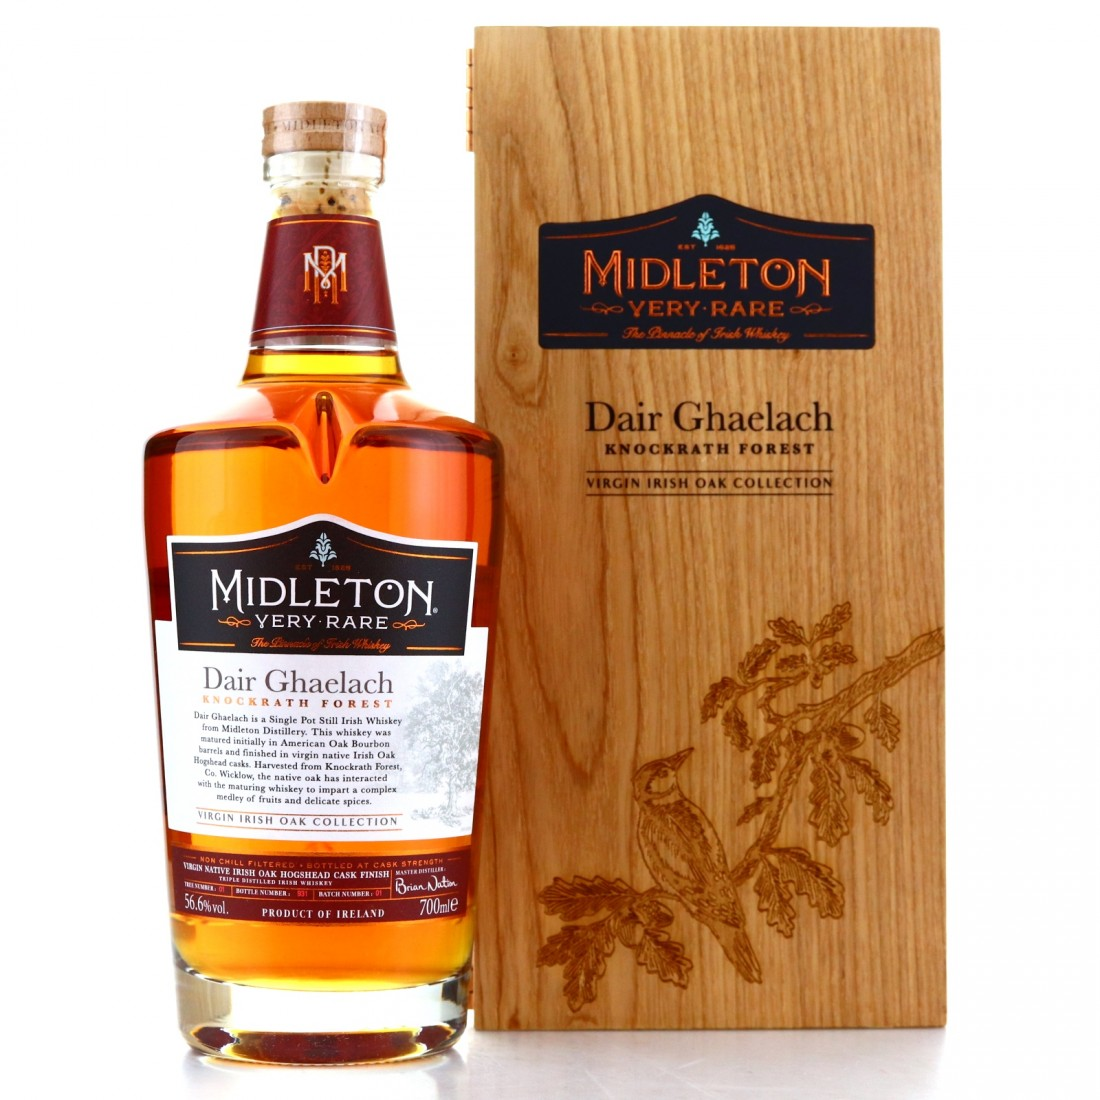 Midleton Dair Ghaelach Knockrath Forest Tree No.1